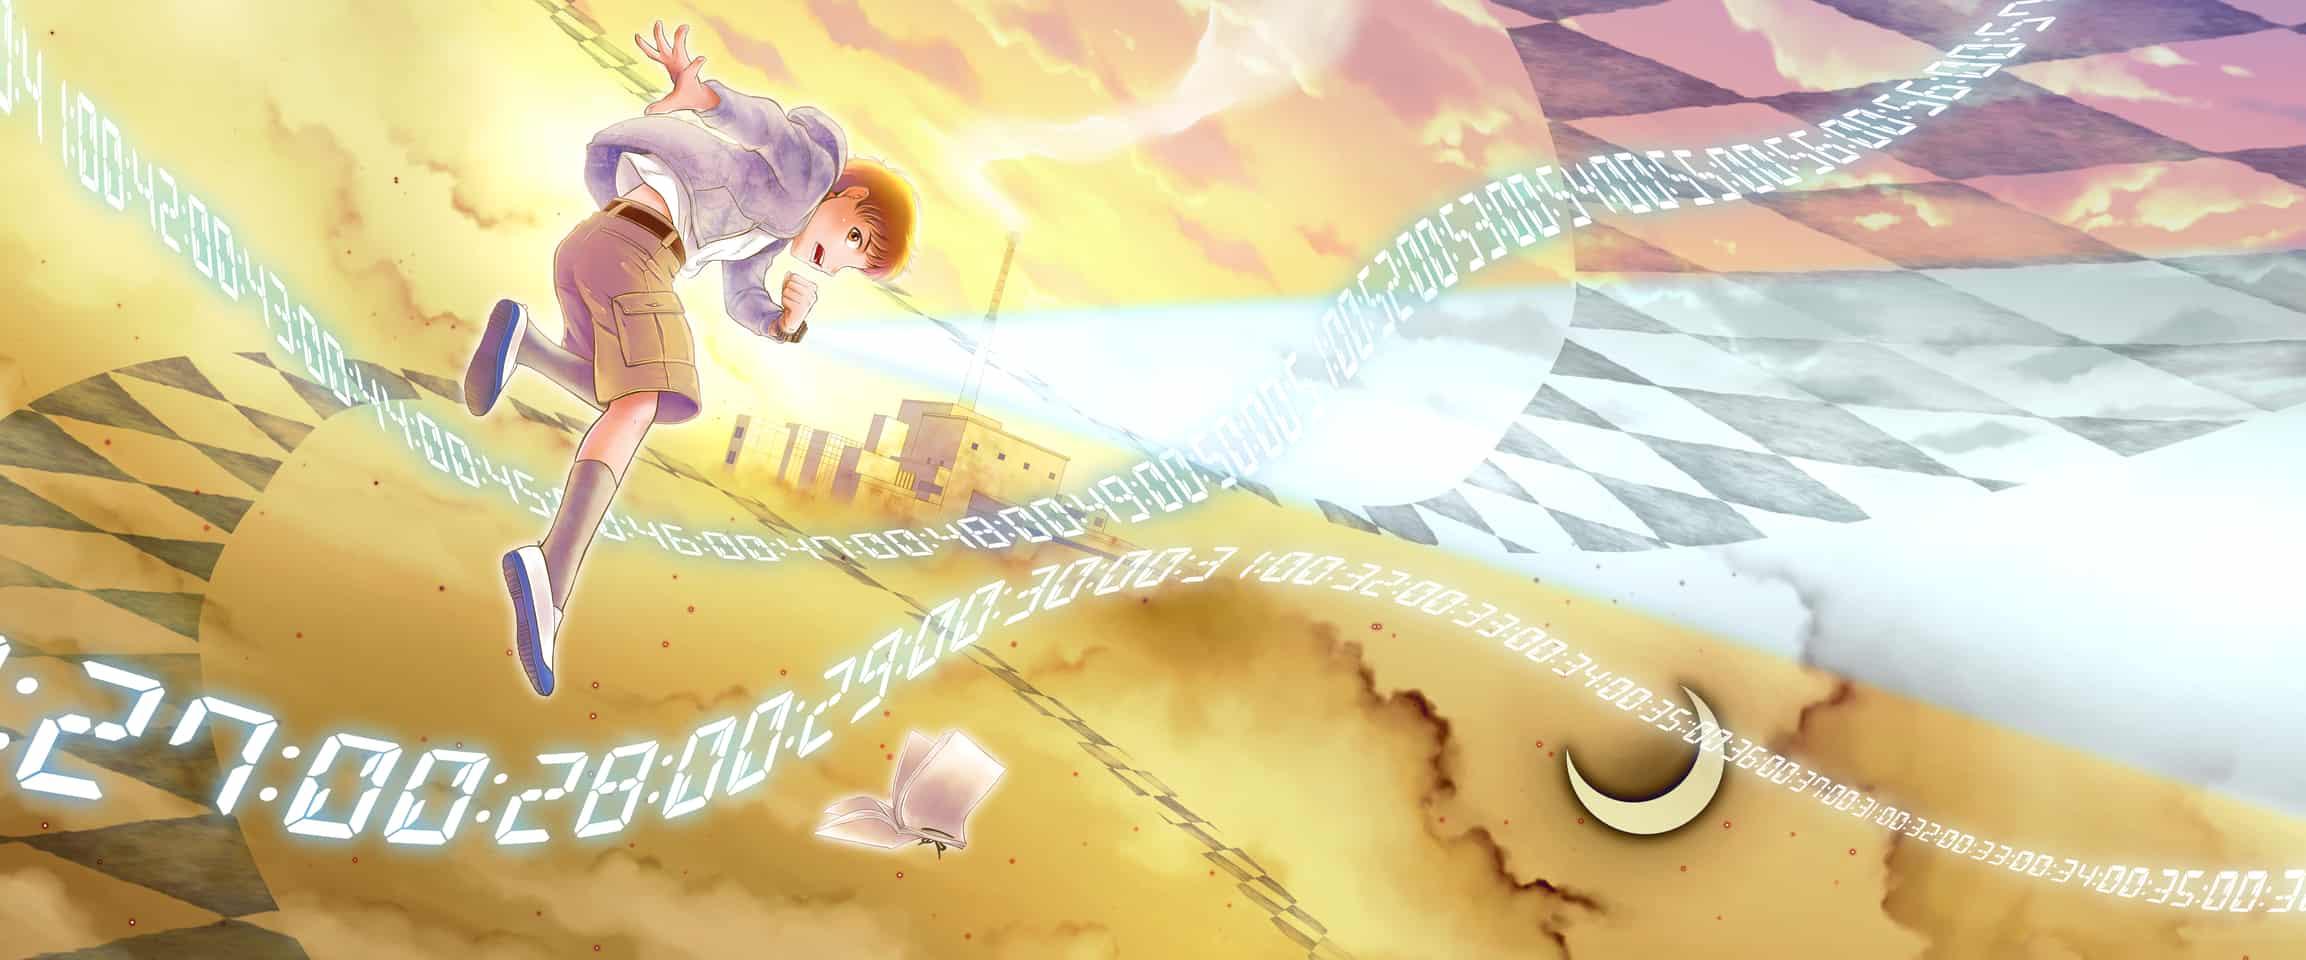 Gururito Illust of Shina Spinning_contest boy